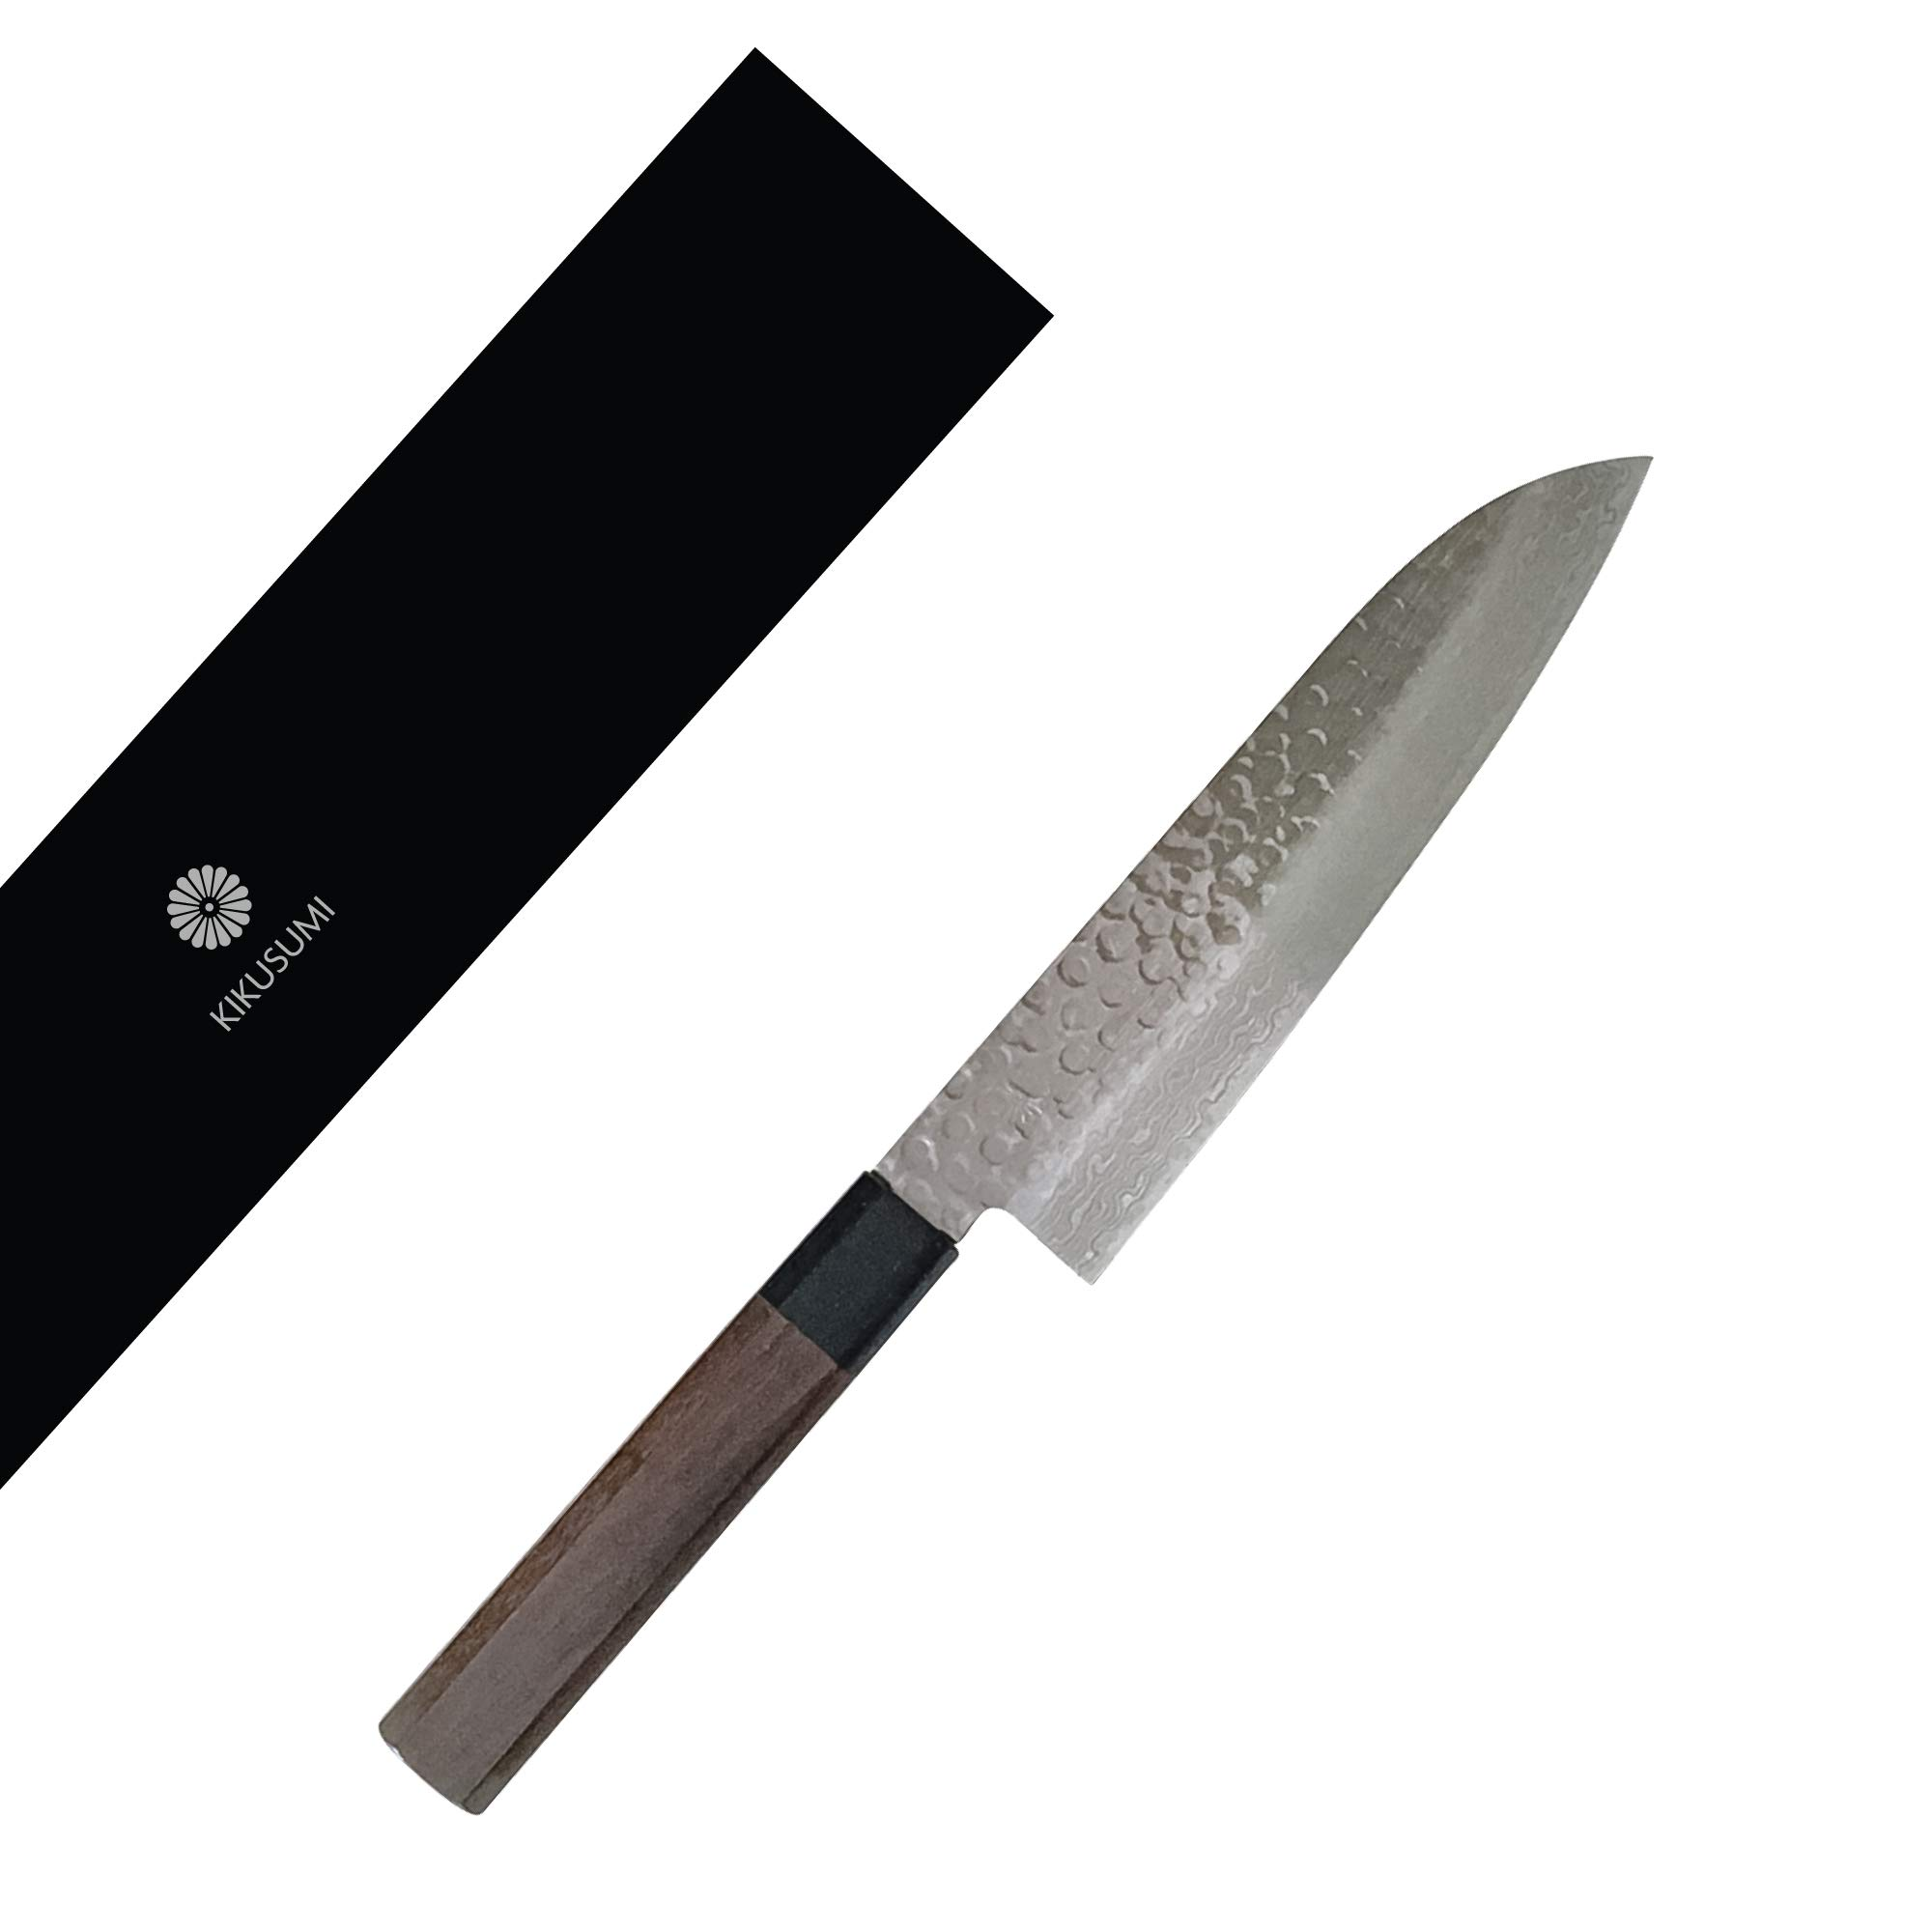 "Kikusumi KATURA 7"" Santoku Knife 45 Layer Damascus Steel AUS10 + Octagonal Premium Wood Handle - Made in Japan (Rosewood, 7"" / 18 cm)"